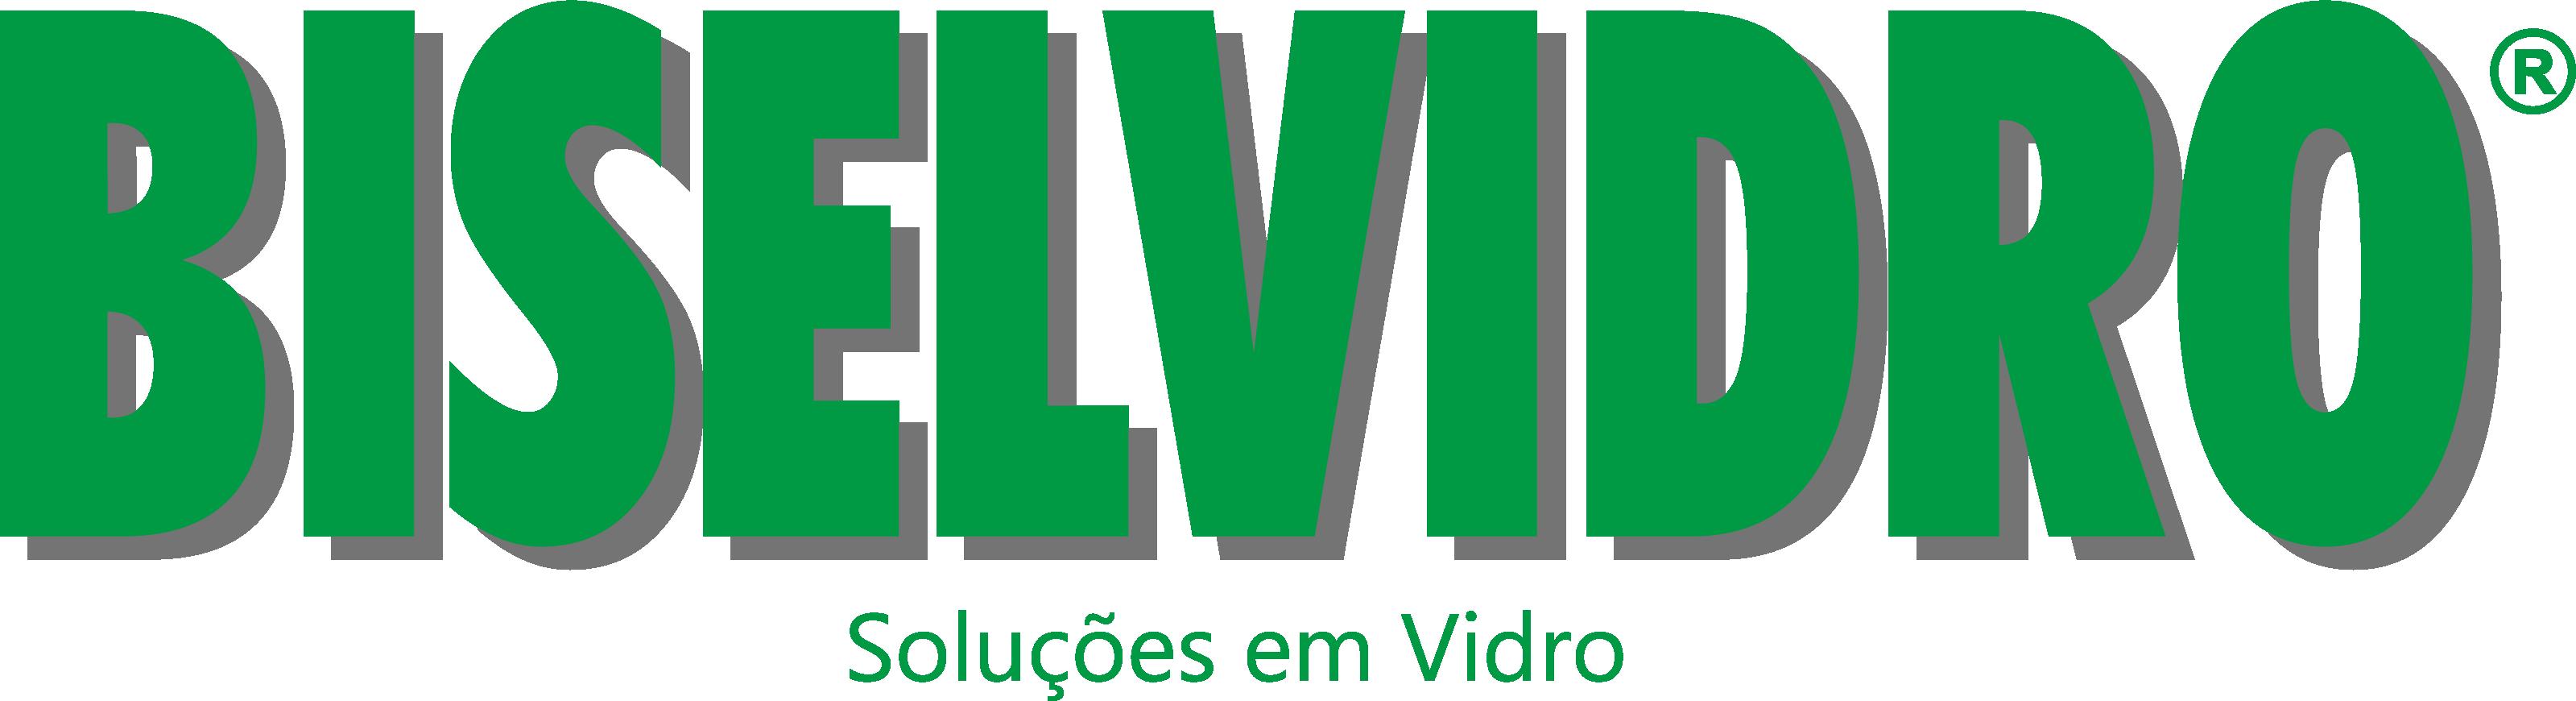 BISELVIDRO Logo